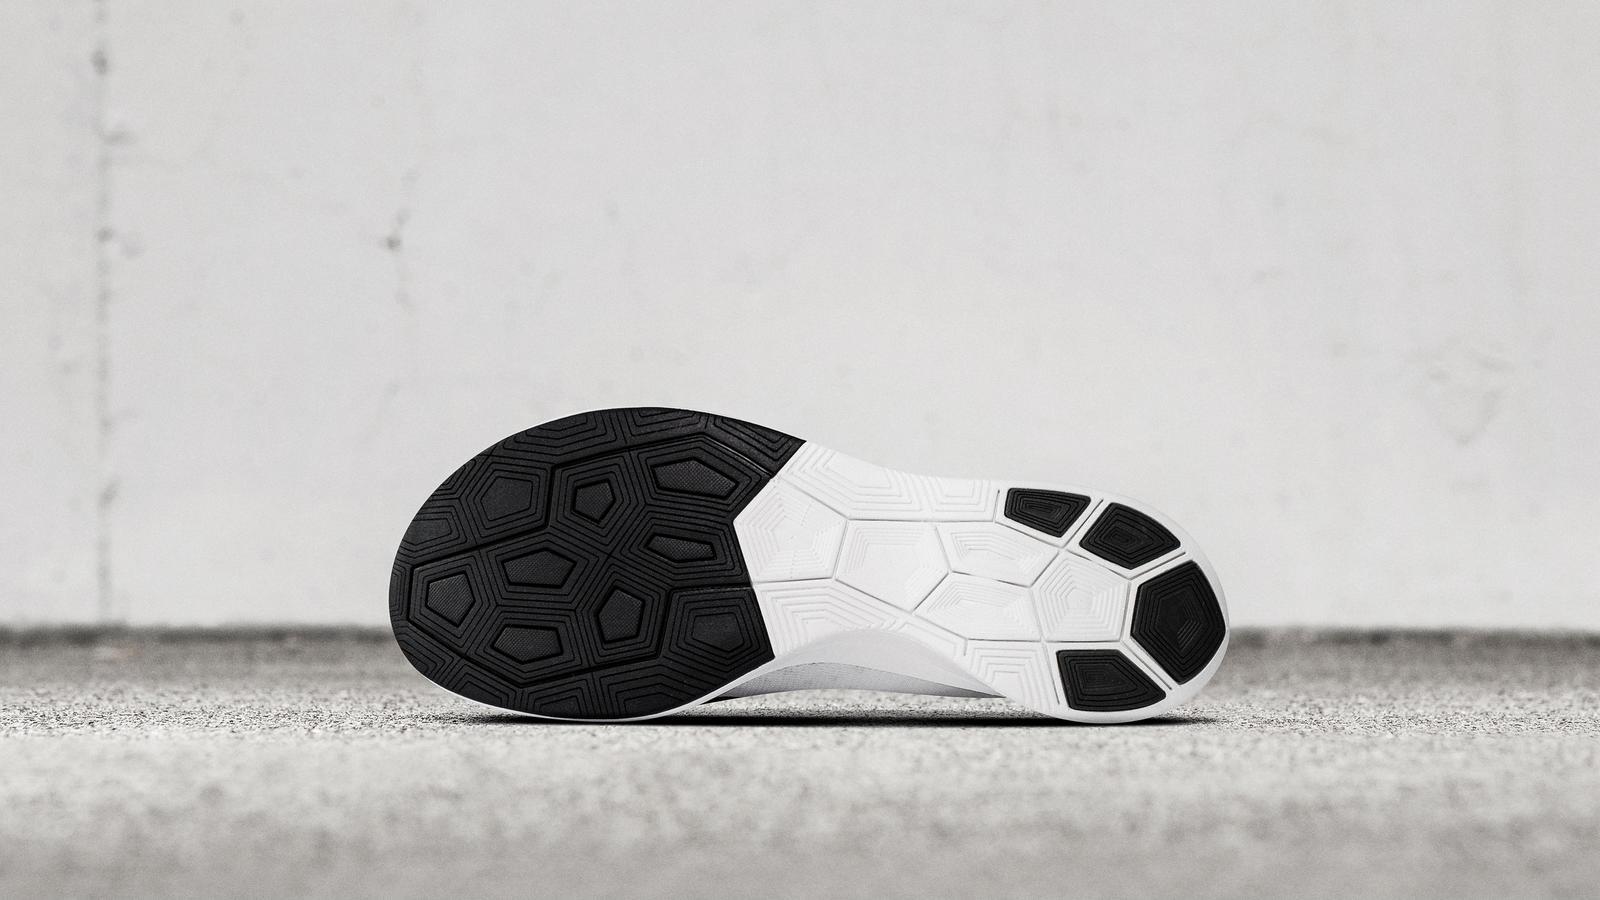 Nike Zoom Vaporfly 4% 0